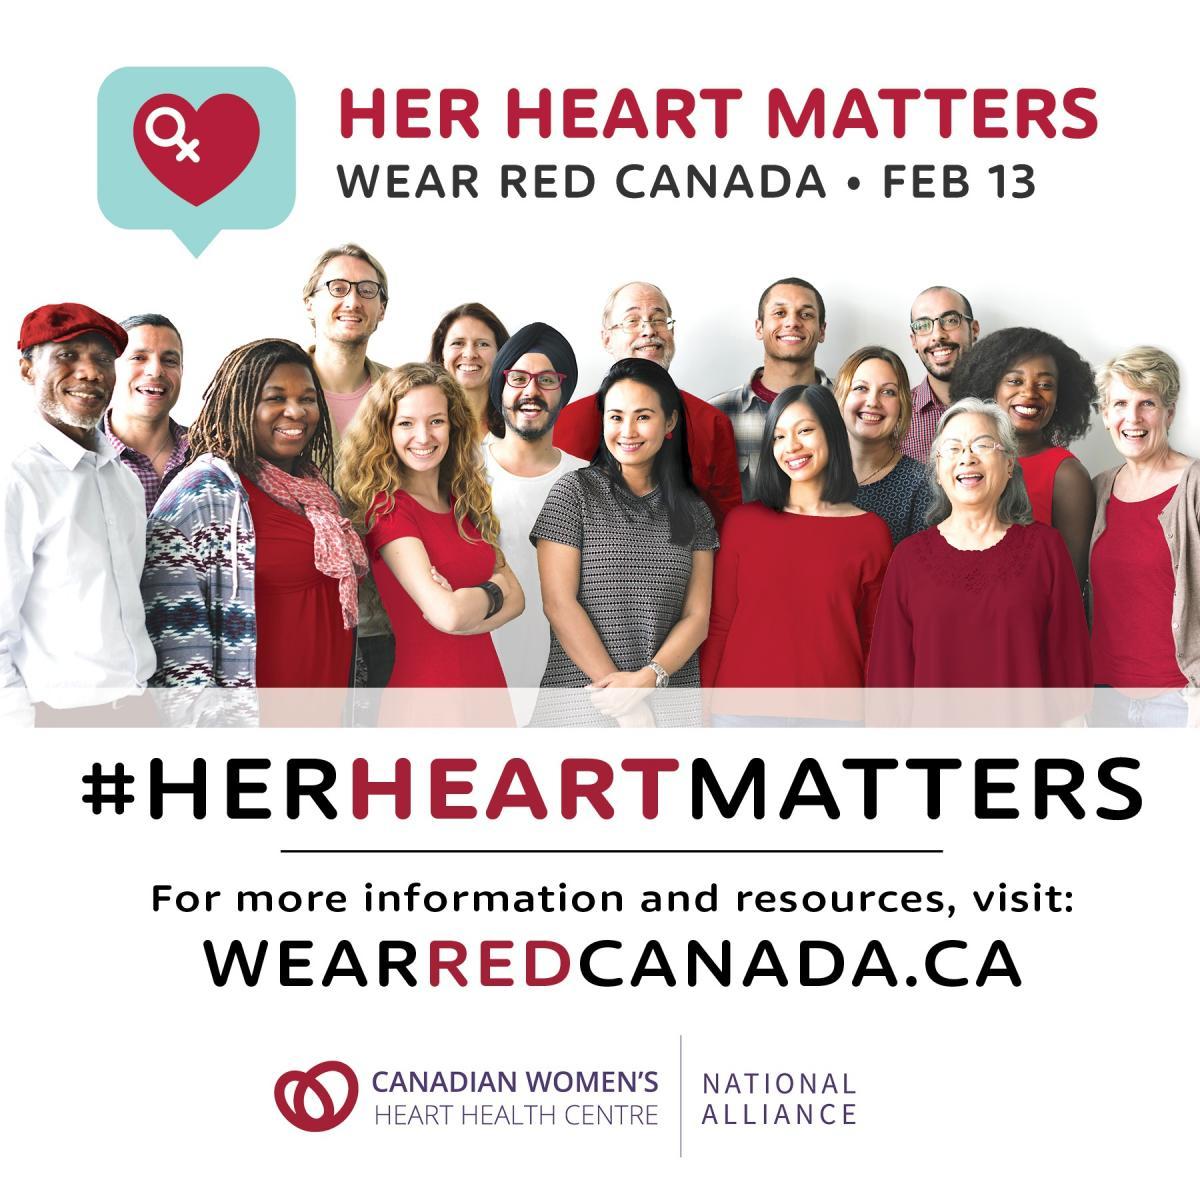 Leslie Diamond Women's Heart Health Clinic (@Women__Heart) on Twitter photo 21/01/2020 03:28:23